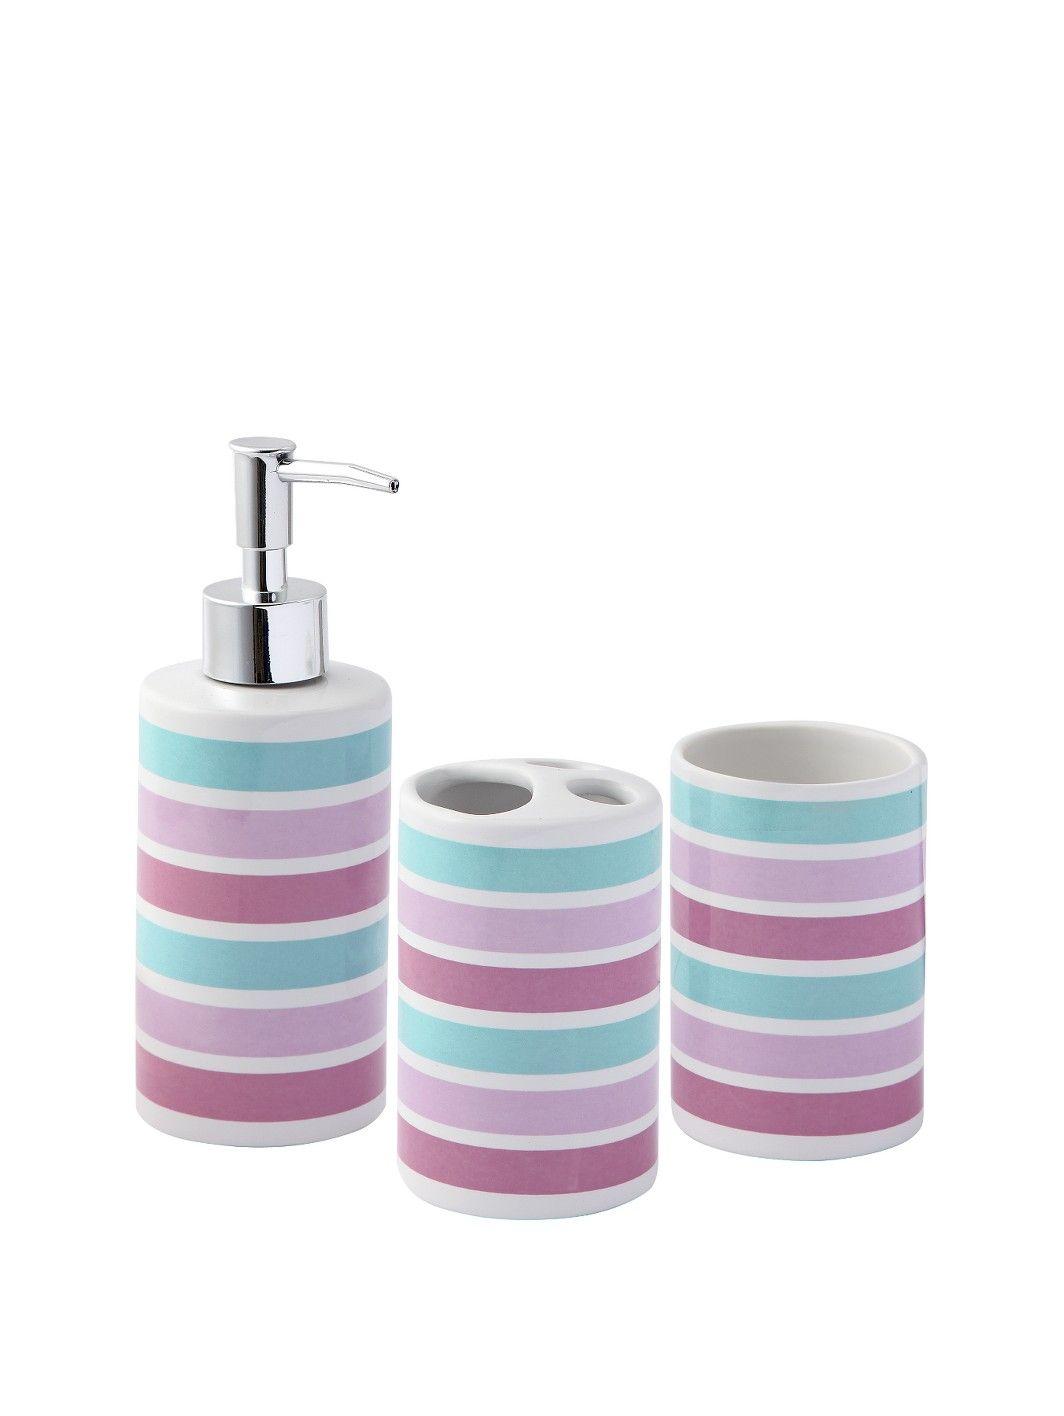 Ink Blossom 3-Piece Bathroom Accessory Set | very.co.uk | Bathroom ...